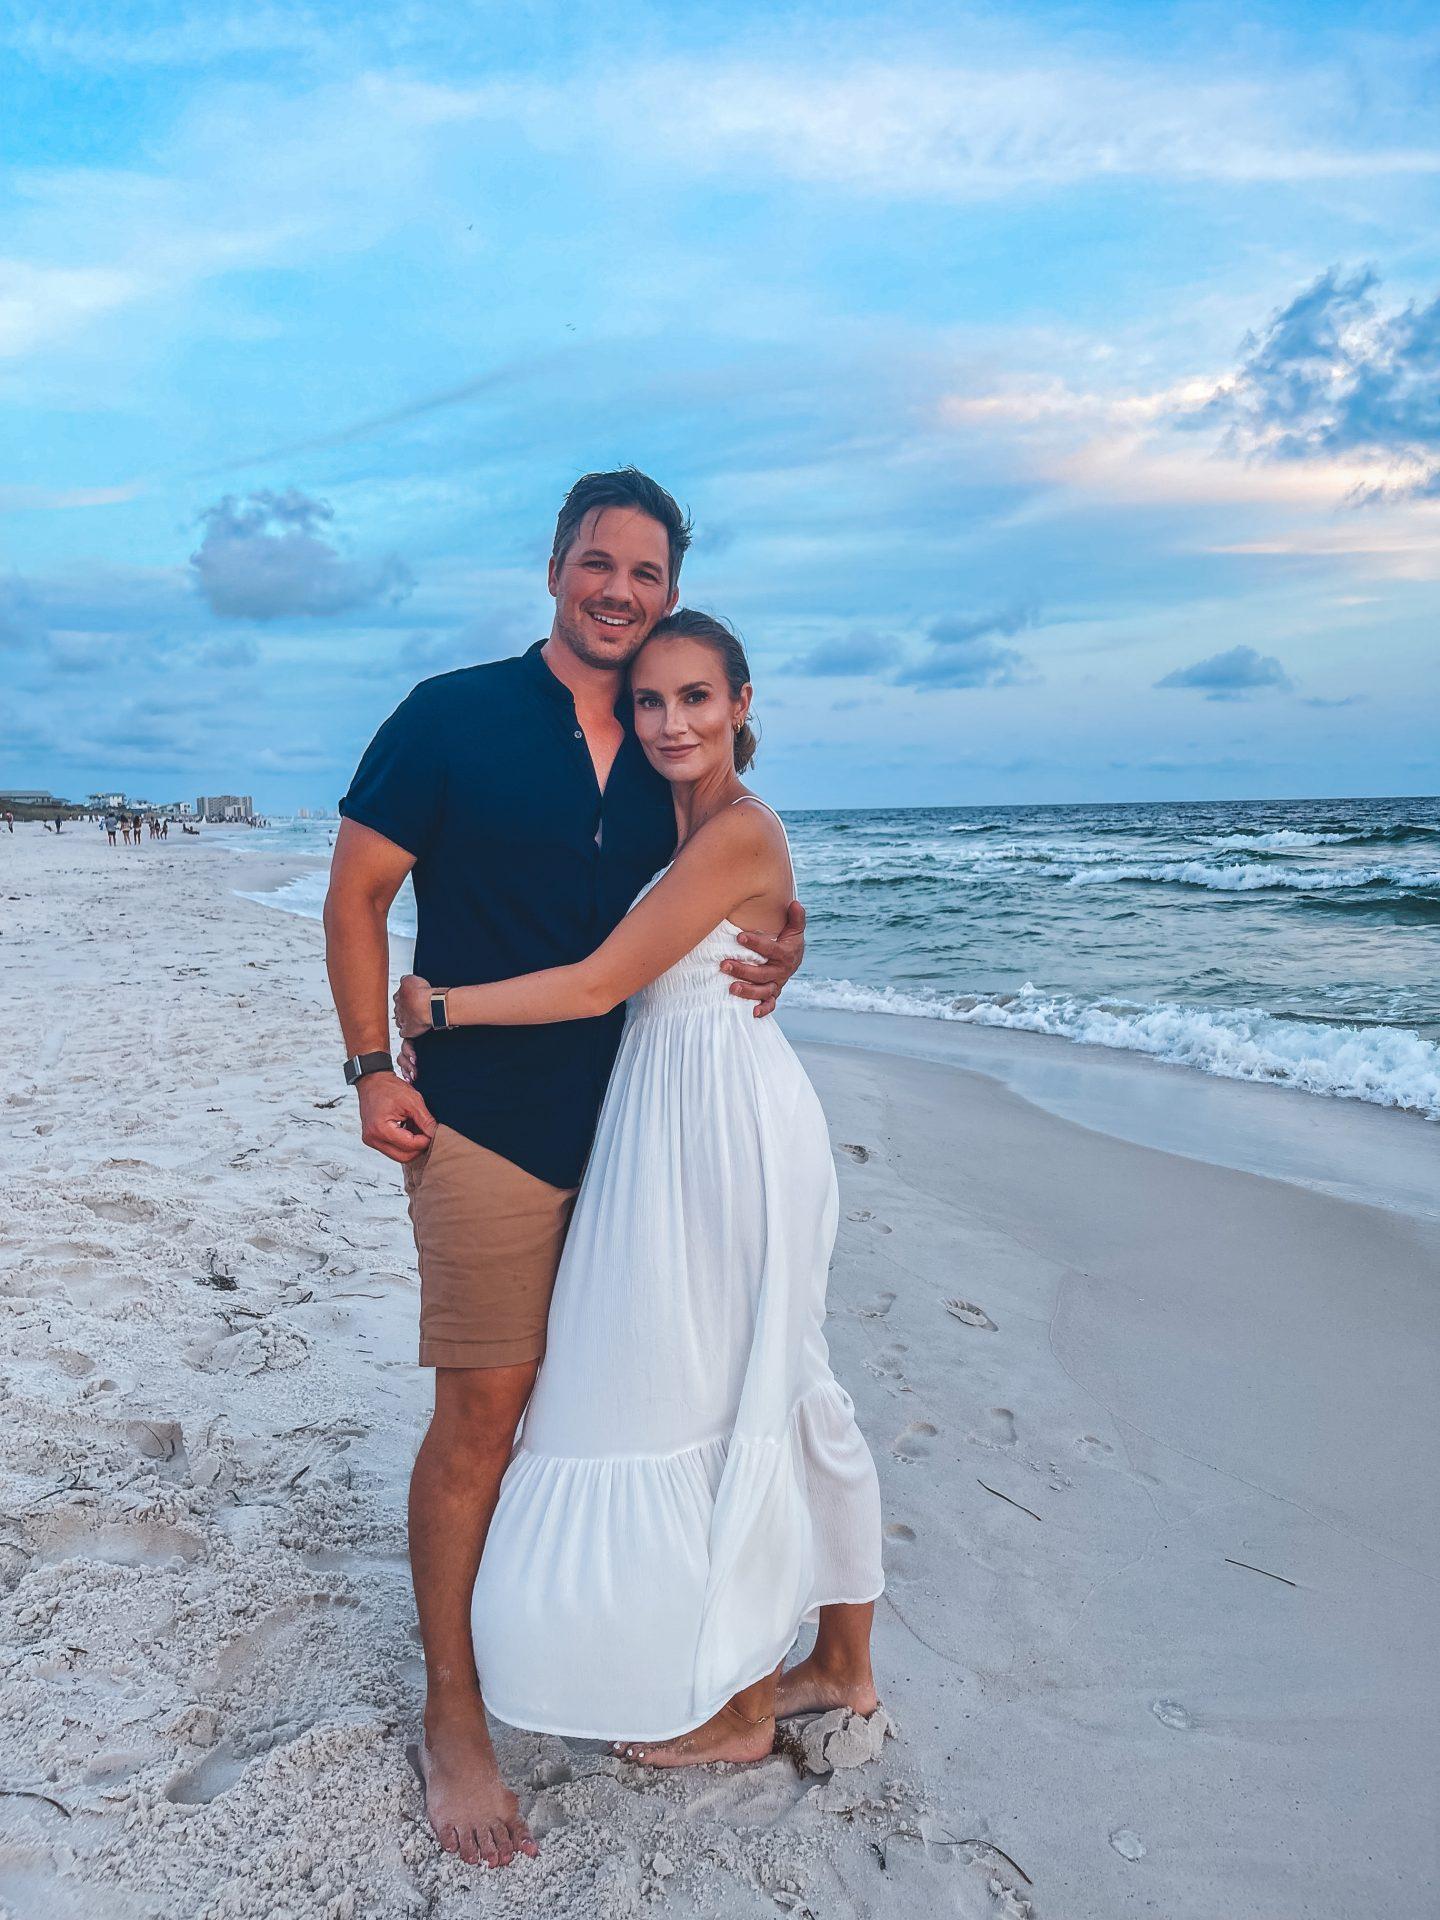 30A Florida Travel Guide 2021